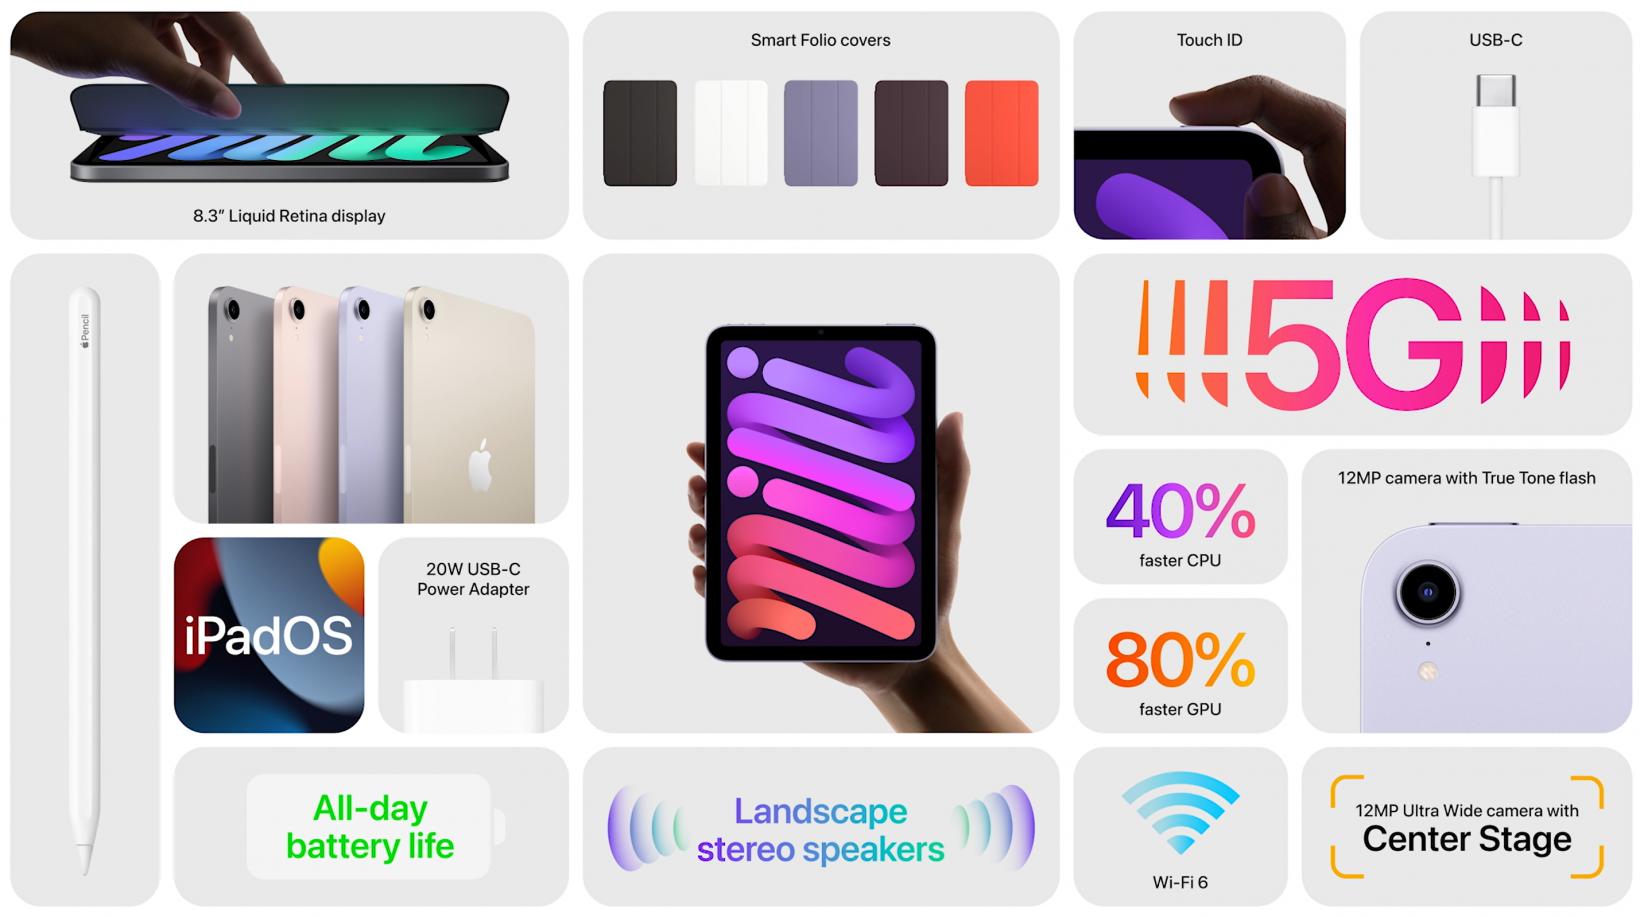 "California streaming, IoT, ""California streaming"" Apple's September 2021 event: Live updates"